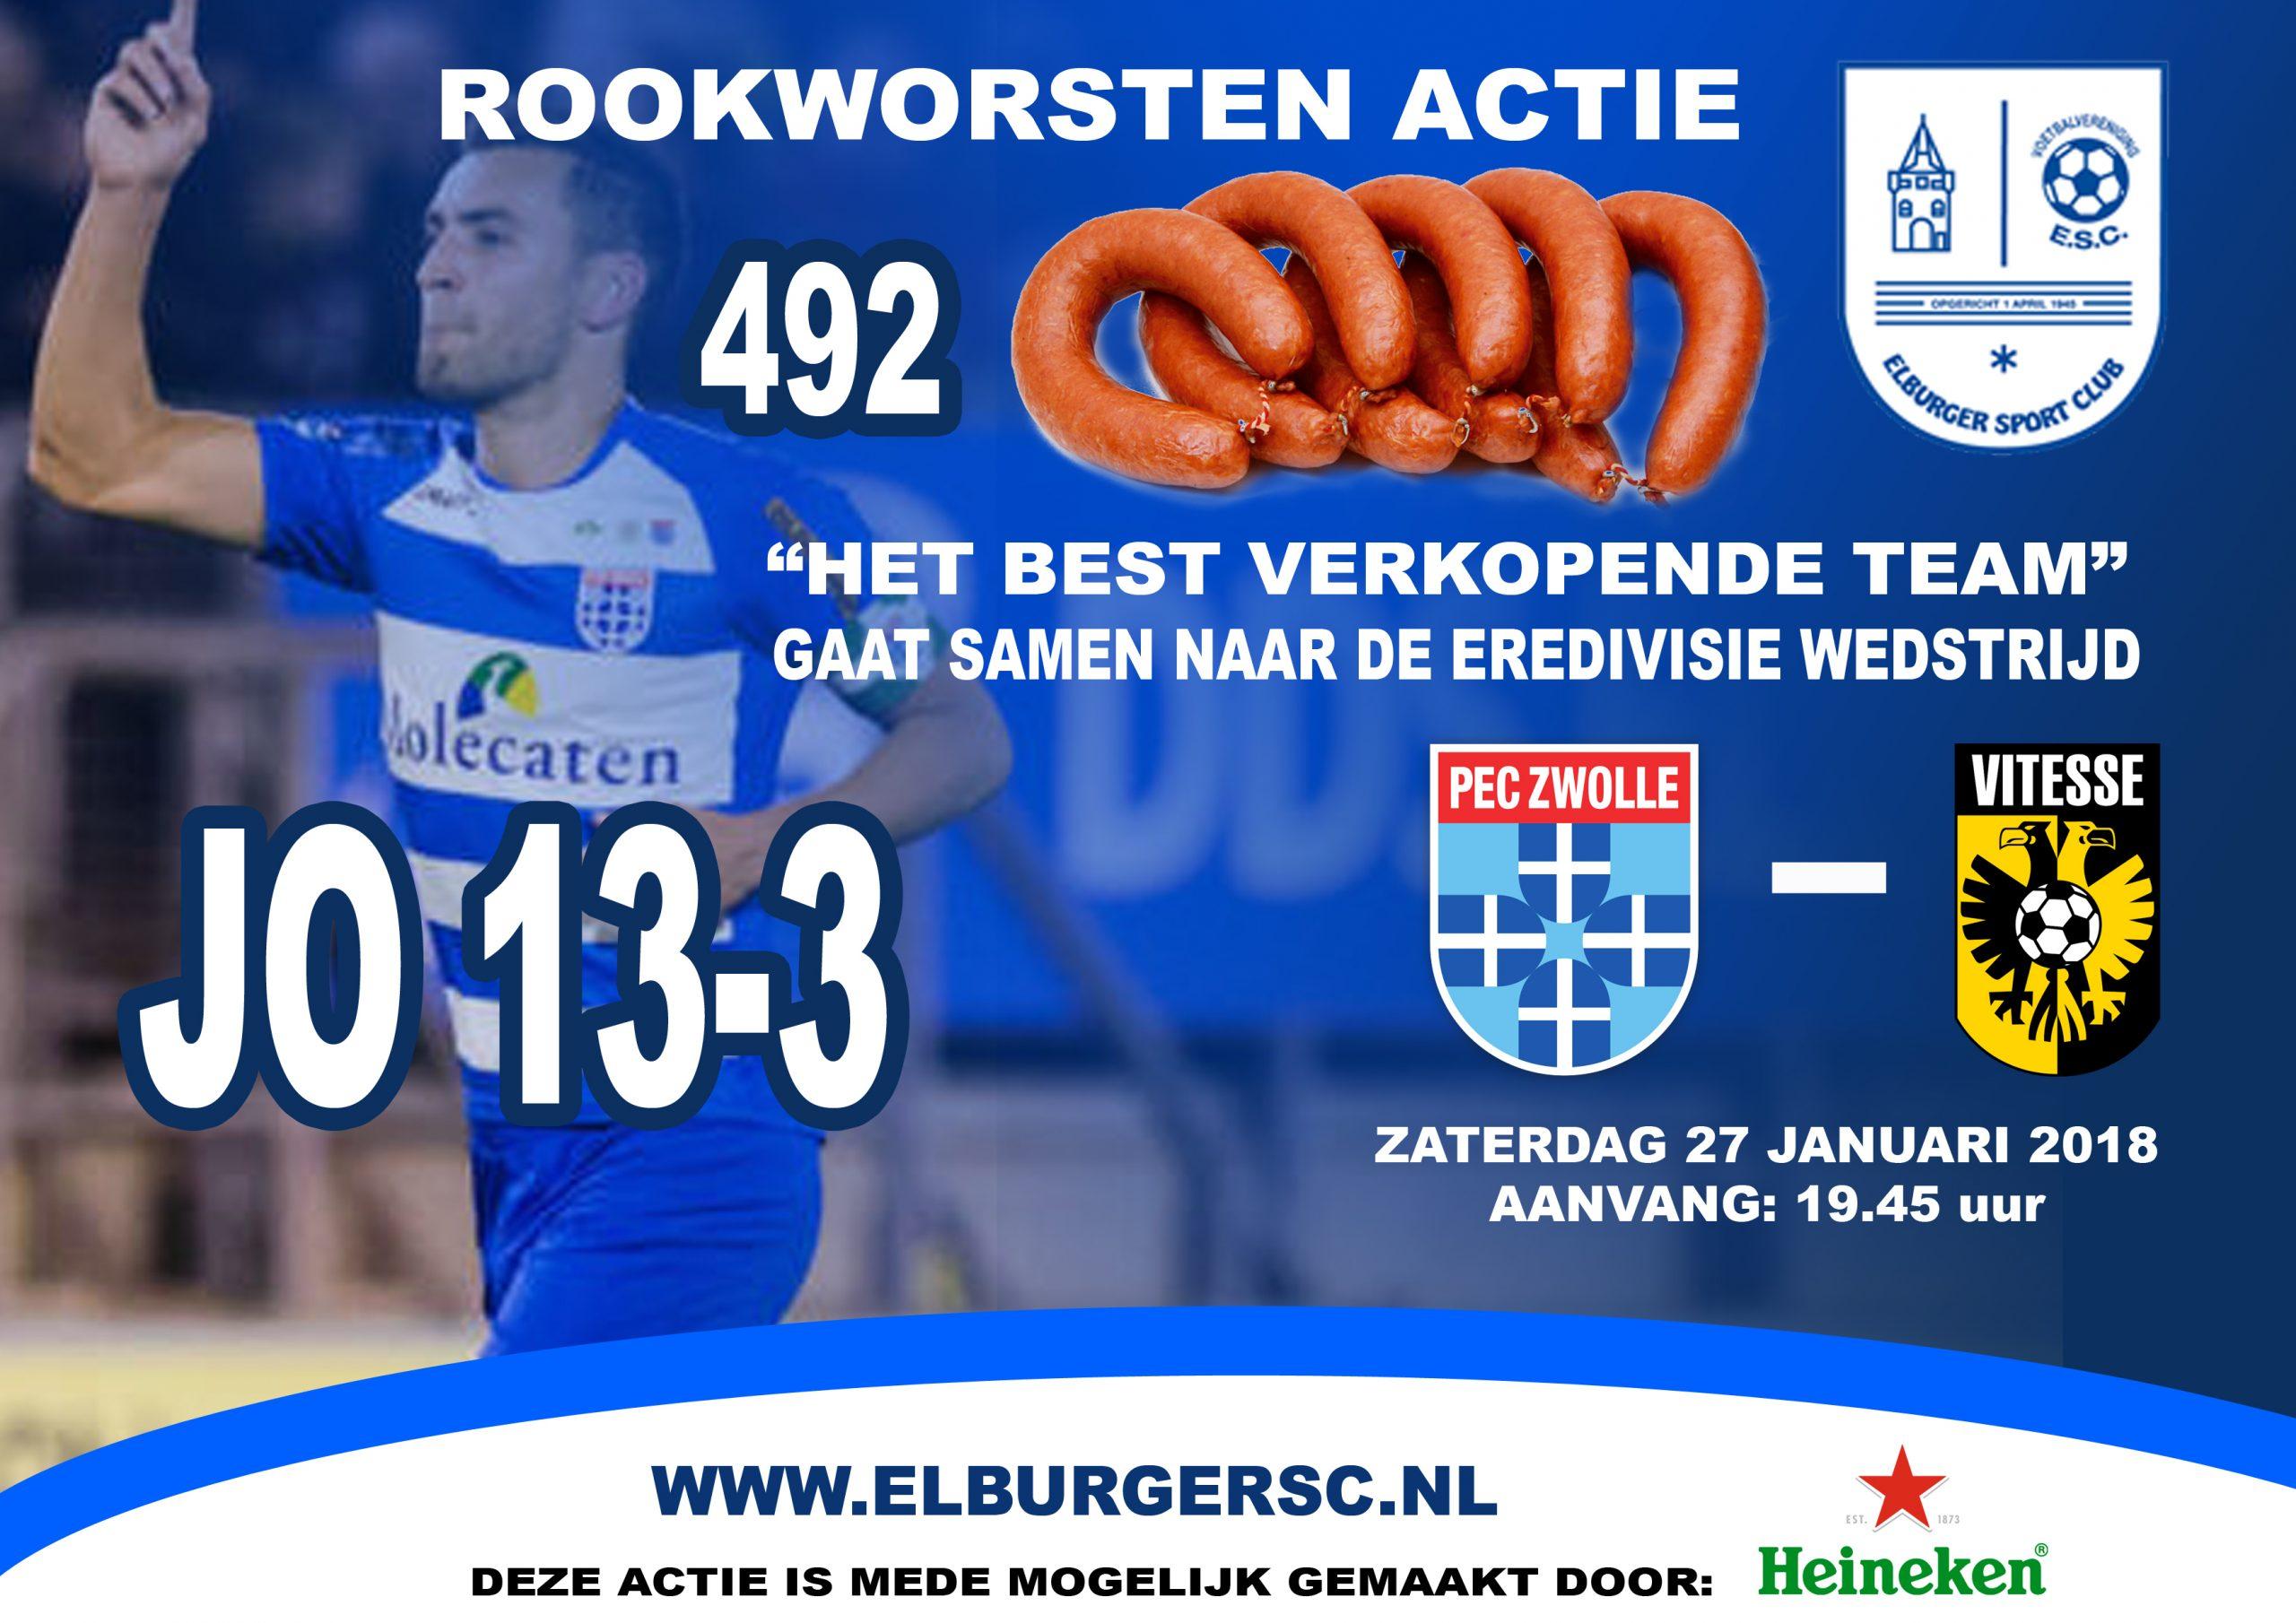 JO13-3 best verkopende team - Elburger SC